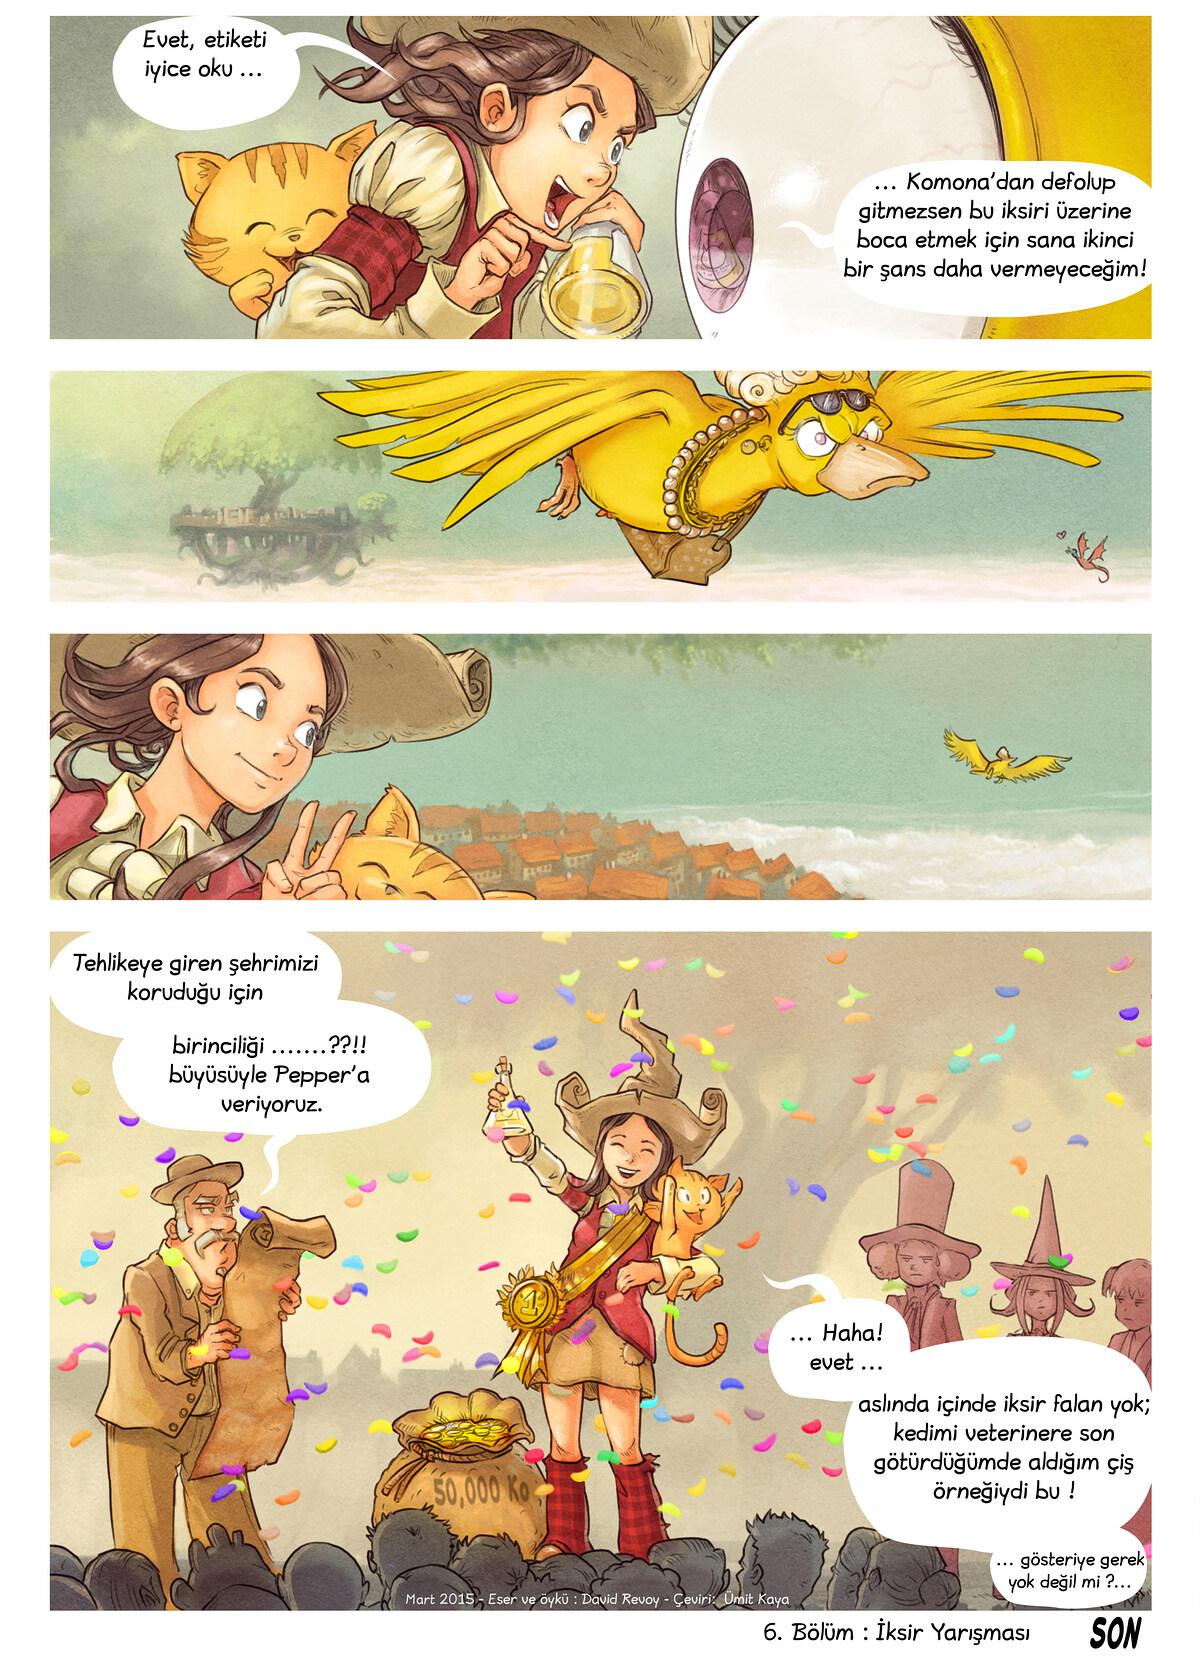 6. Bölüm: İksir Yarışması, Page 9